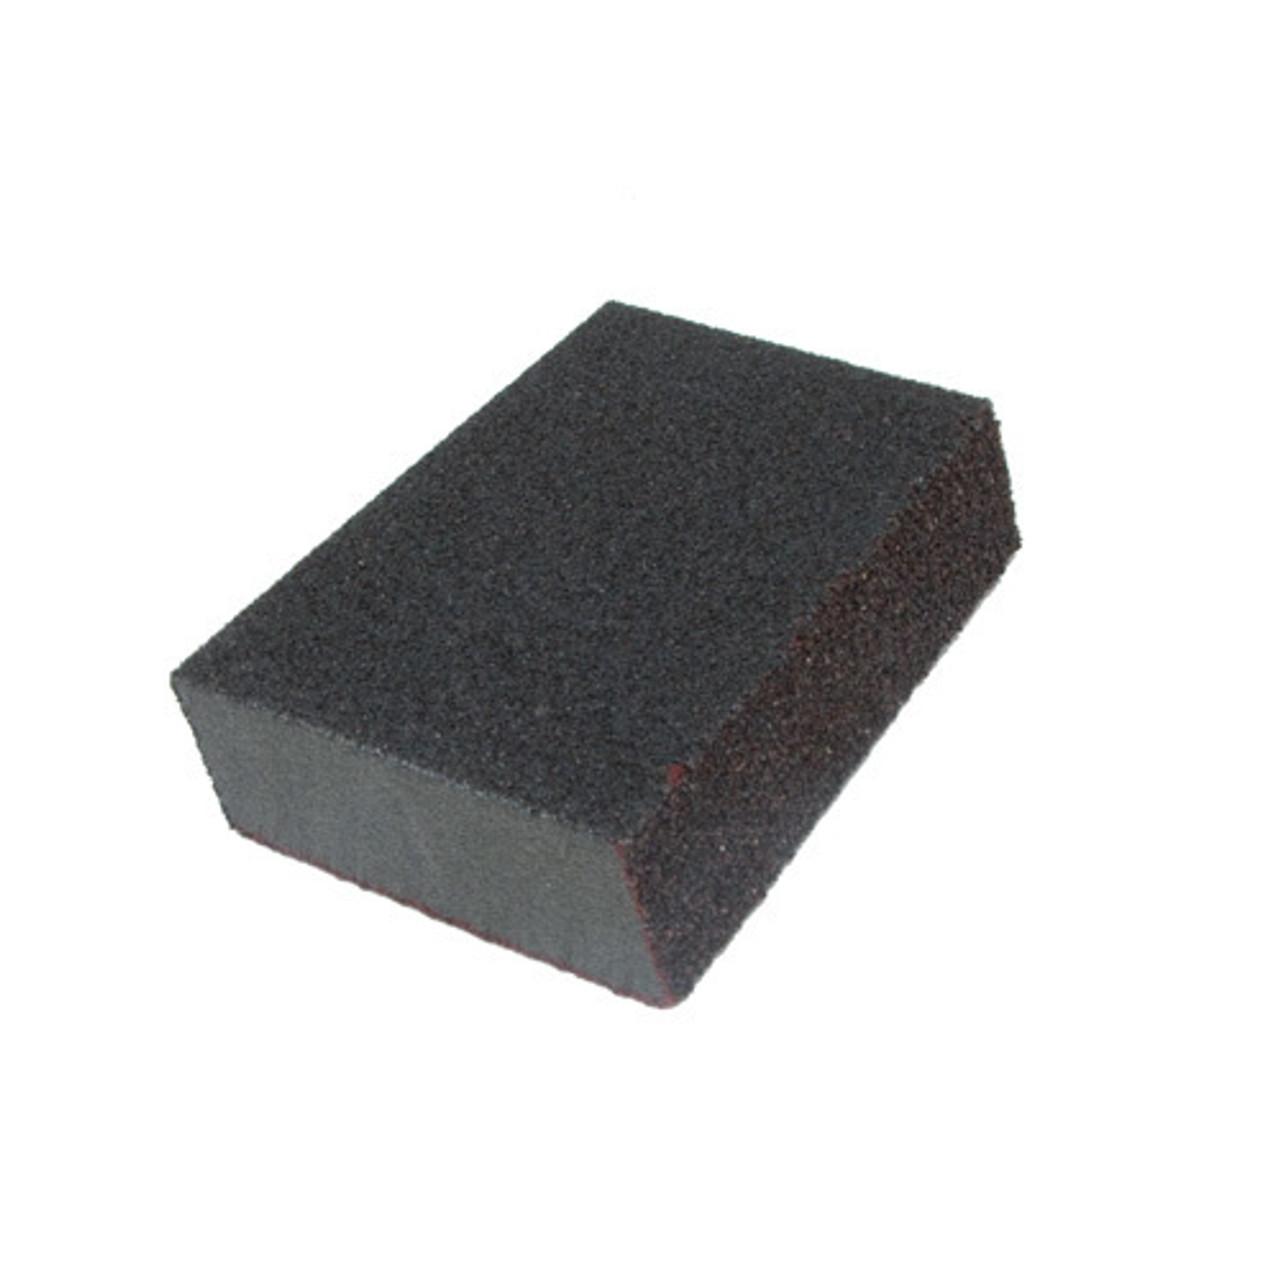 Hand Sanding Sponges